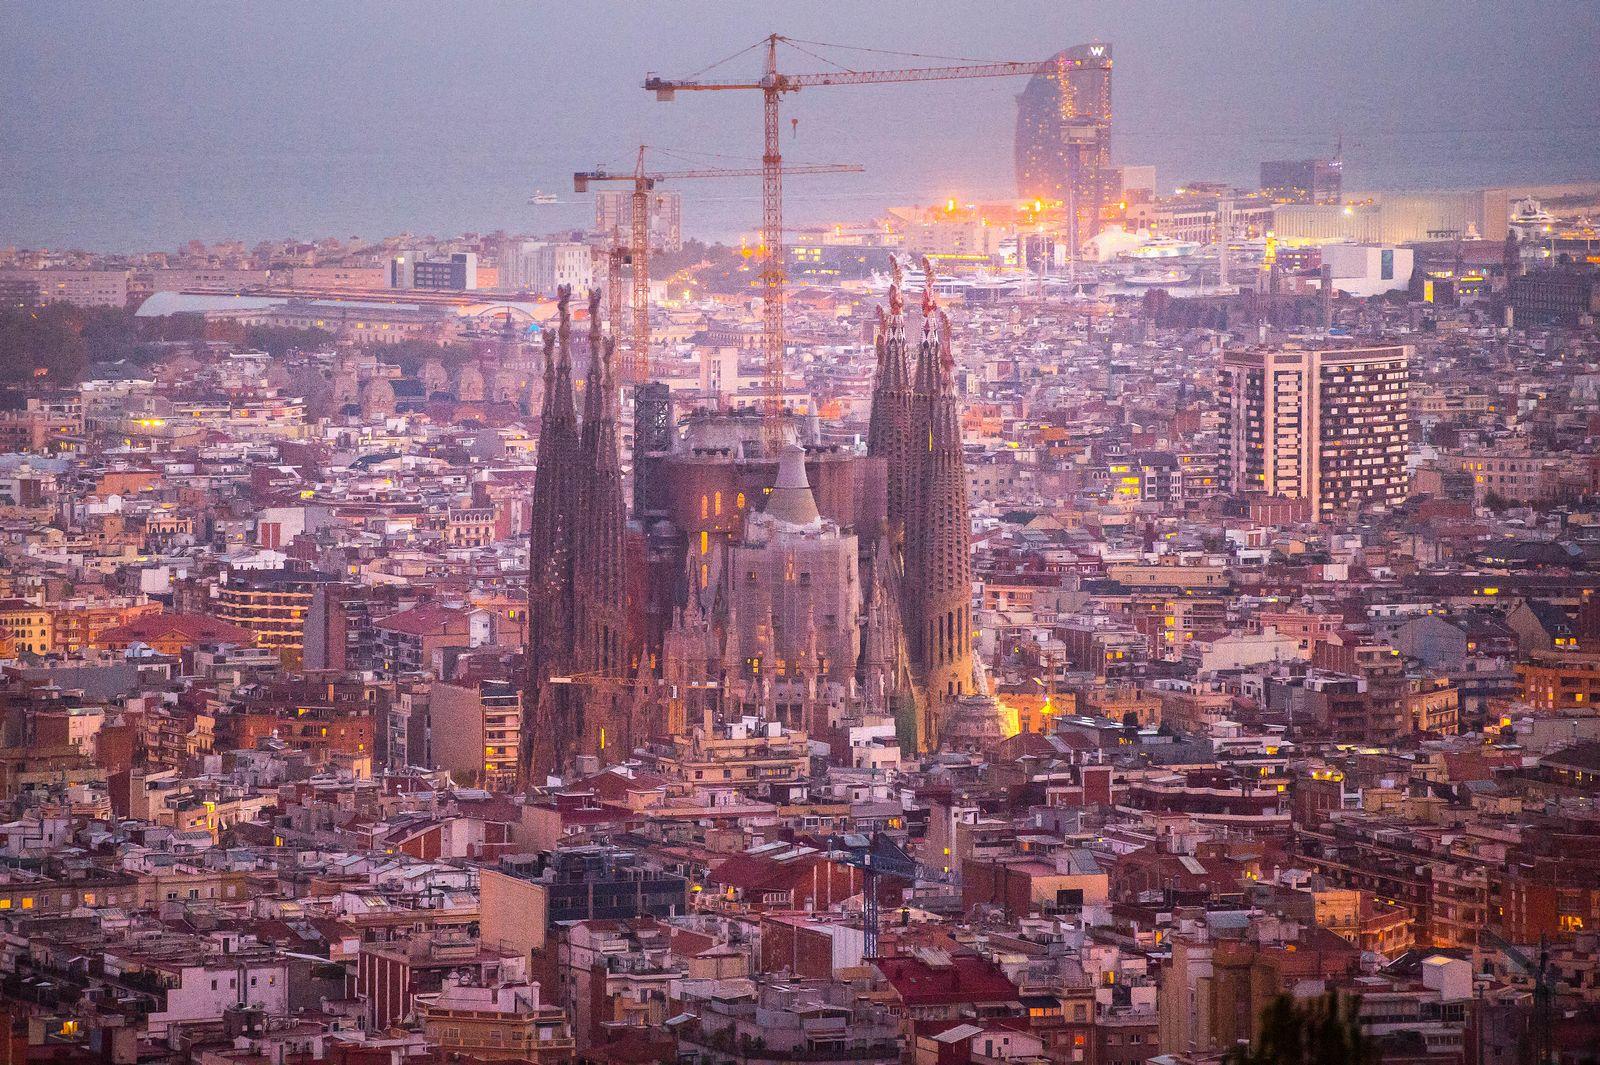 Barcelona / Sagrada Familia / / Stadtansicht / Luftbild